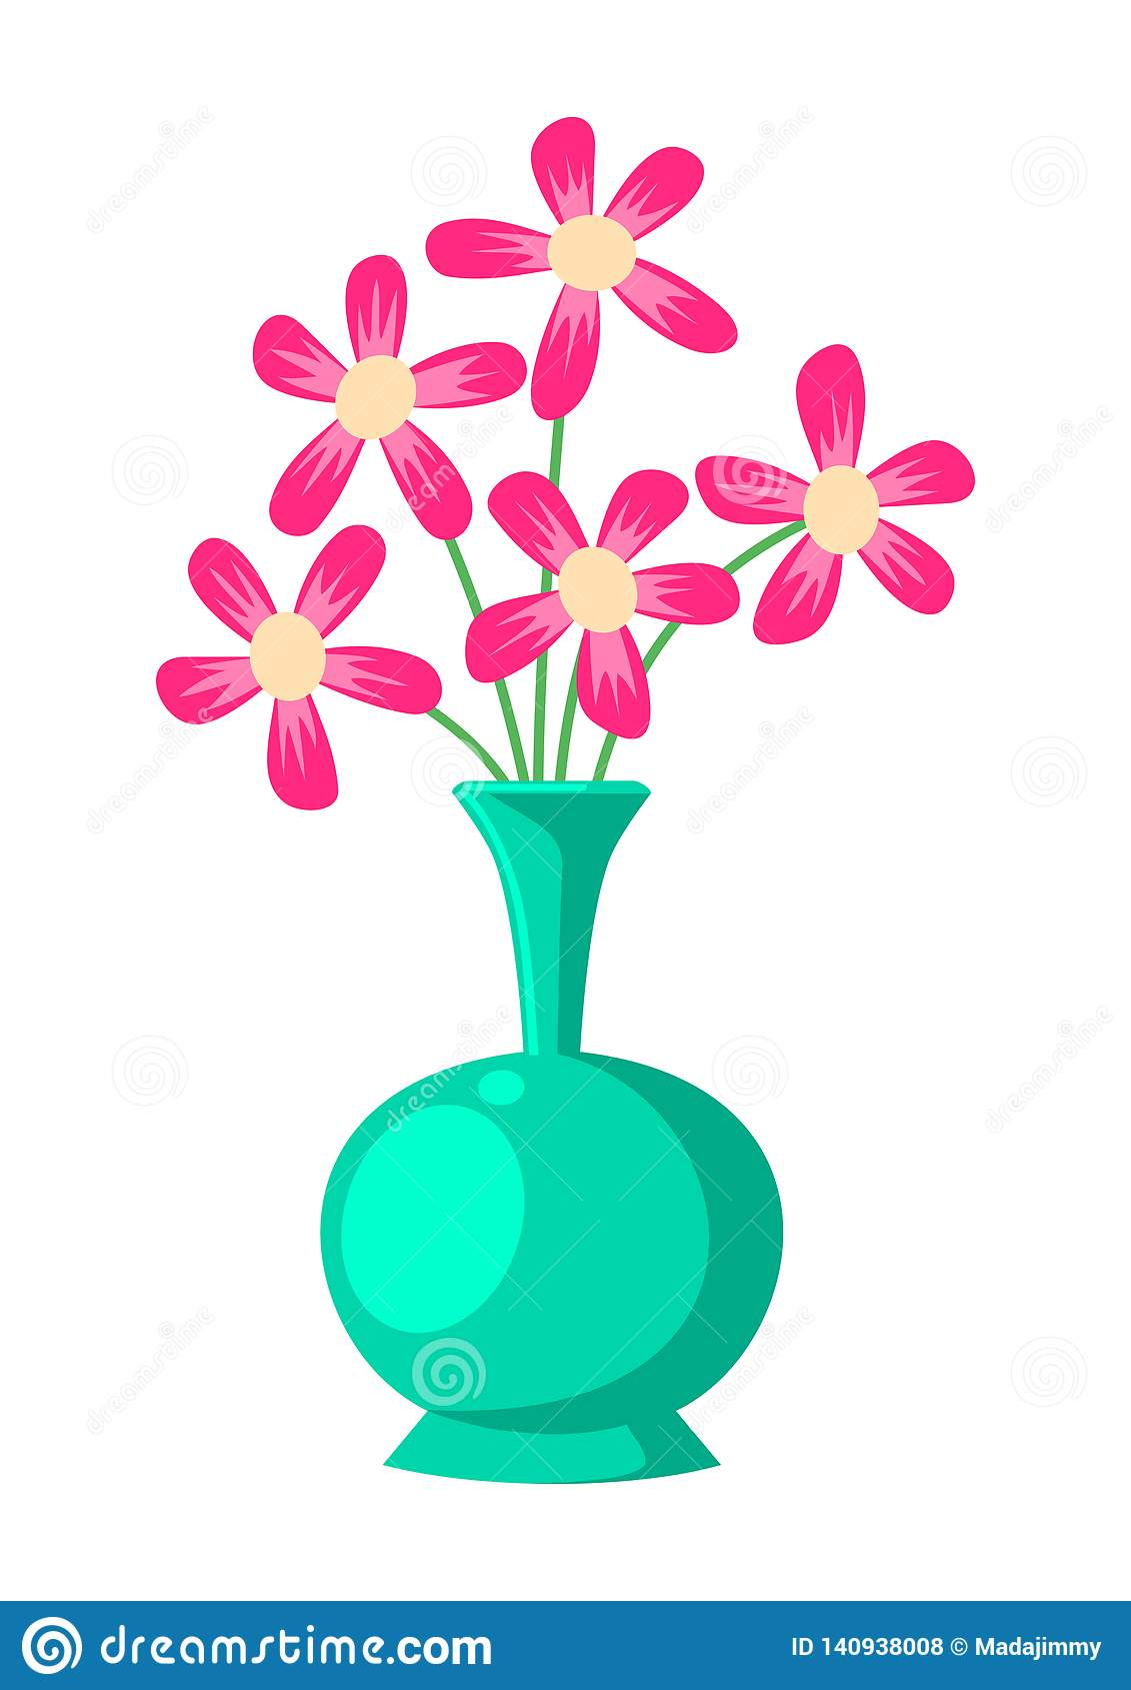 Flower and Vase Illustration Vector